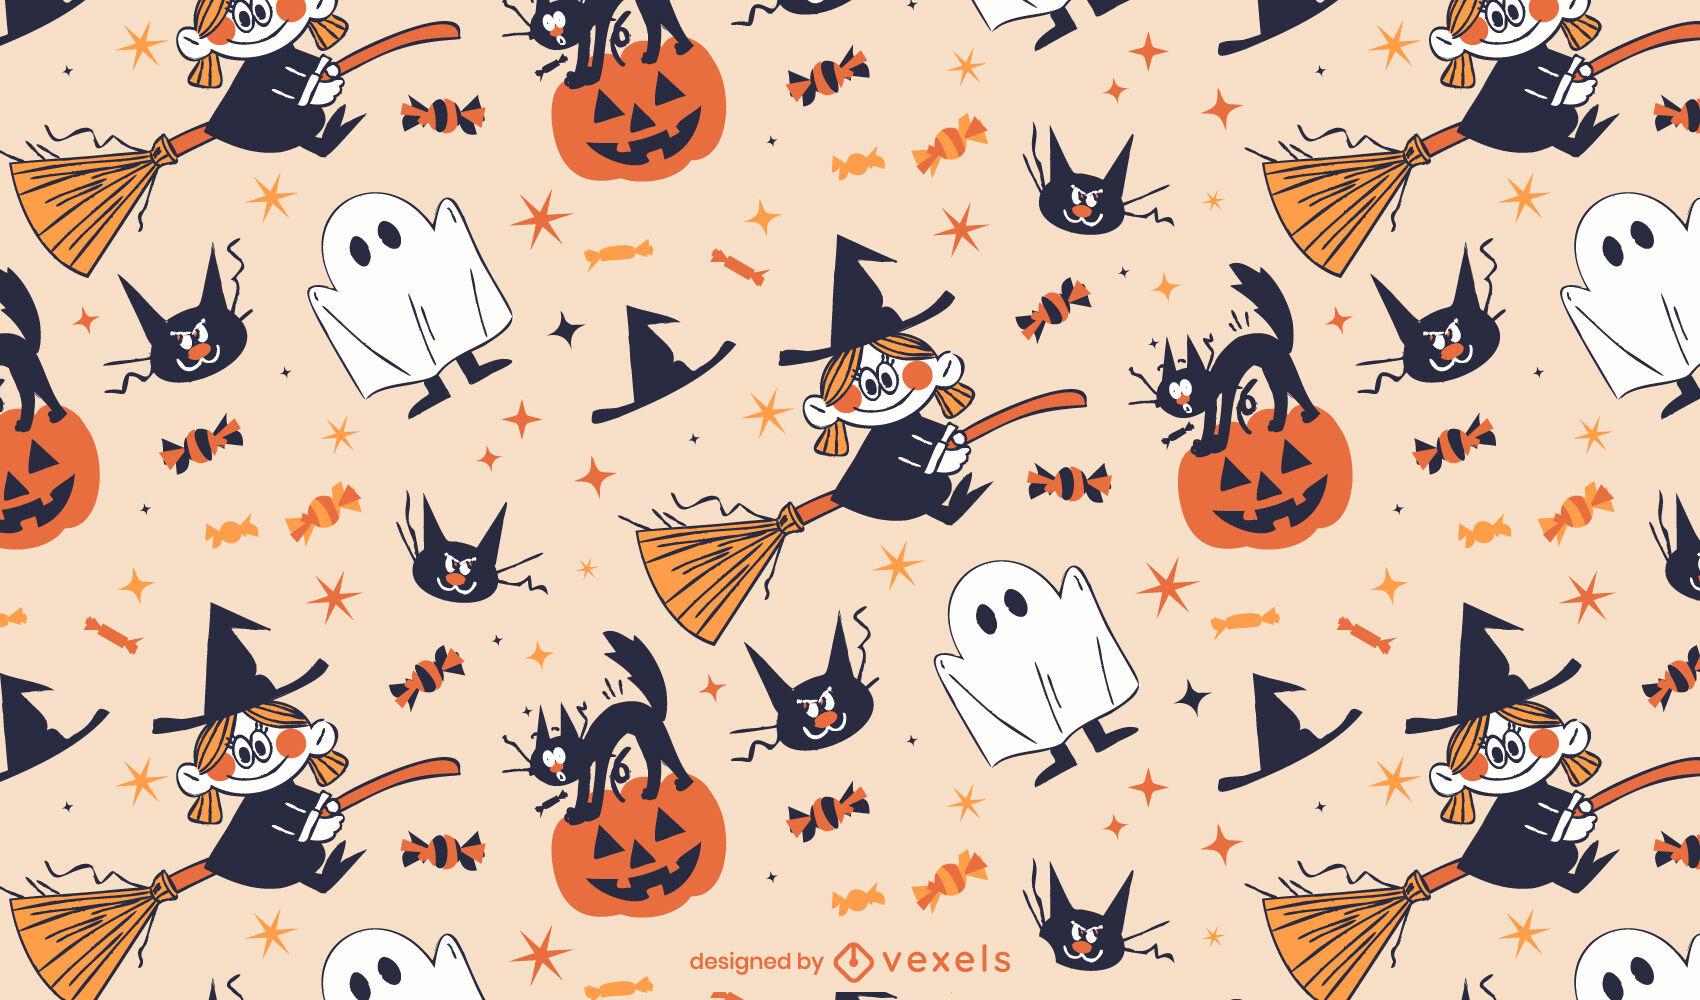 Halloween-Retro-Cartoon-Muster